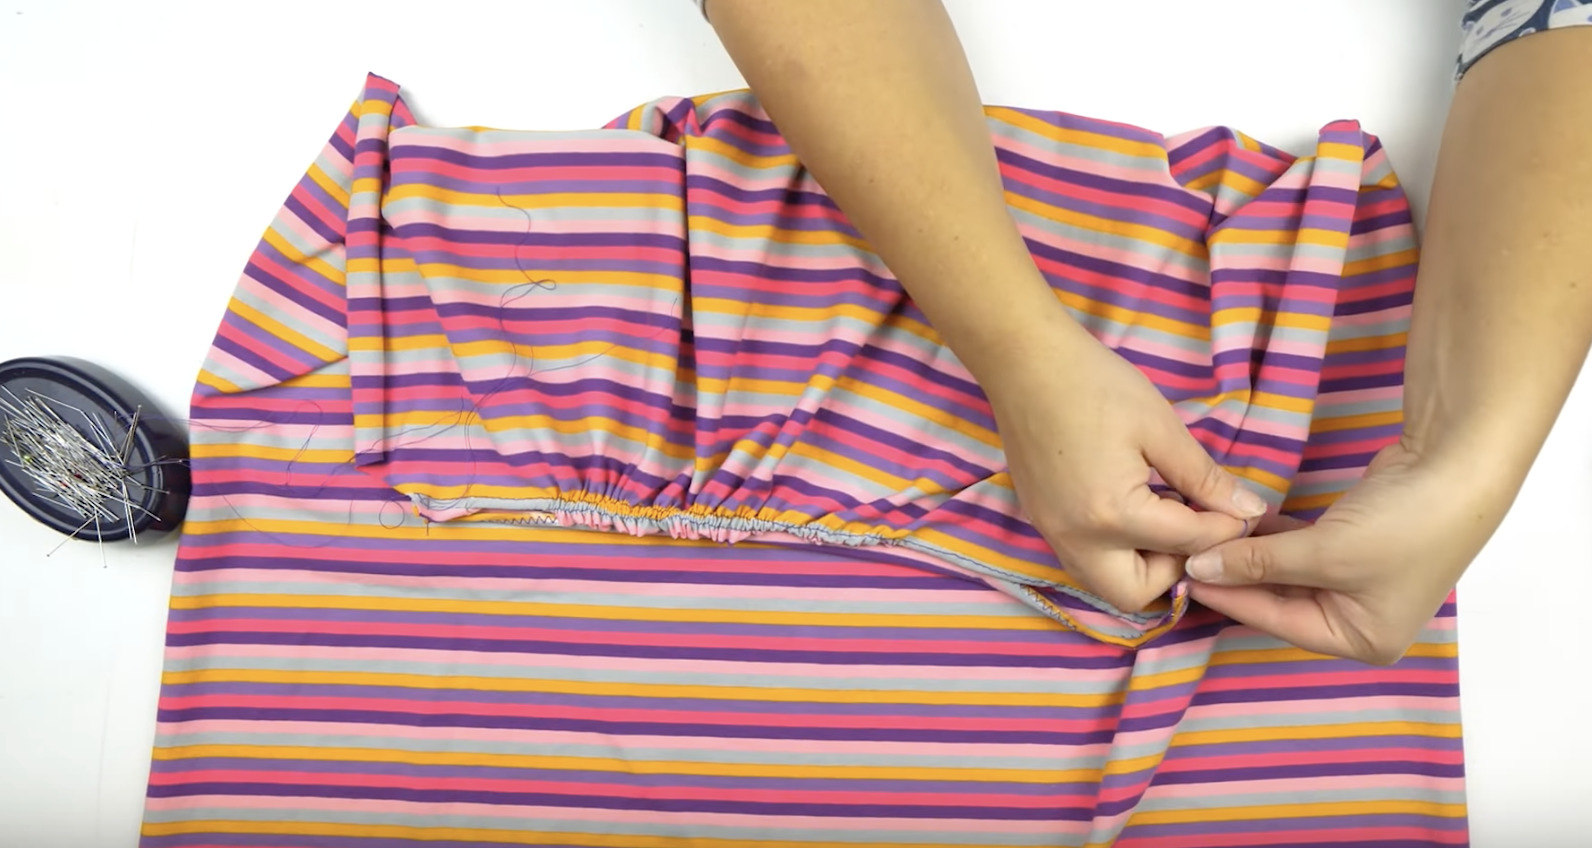 tuto couture comment froncer du jersey